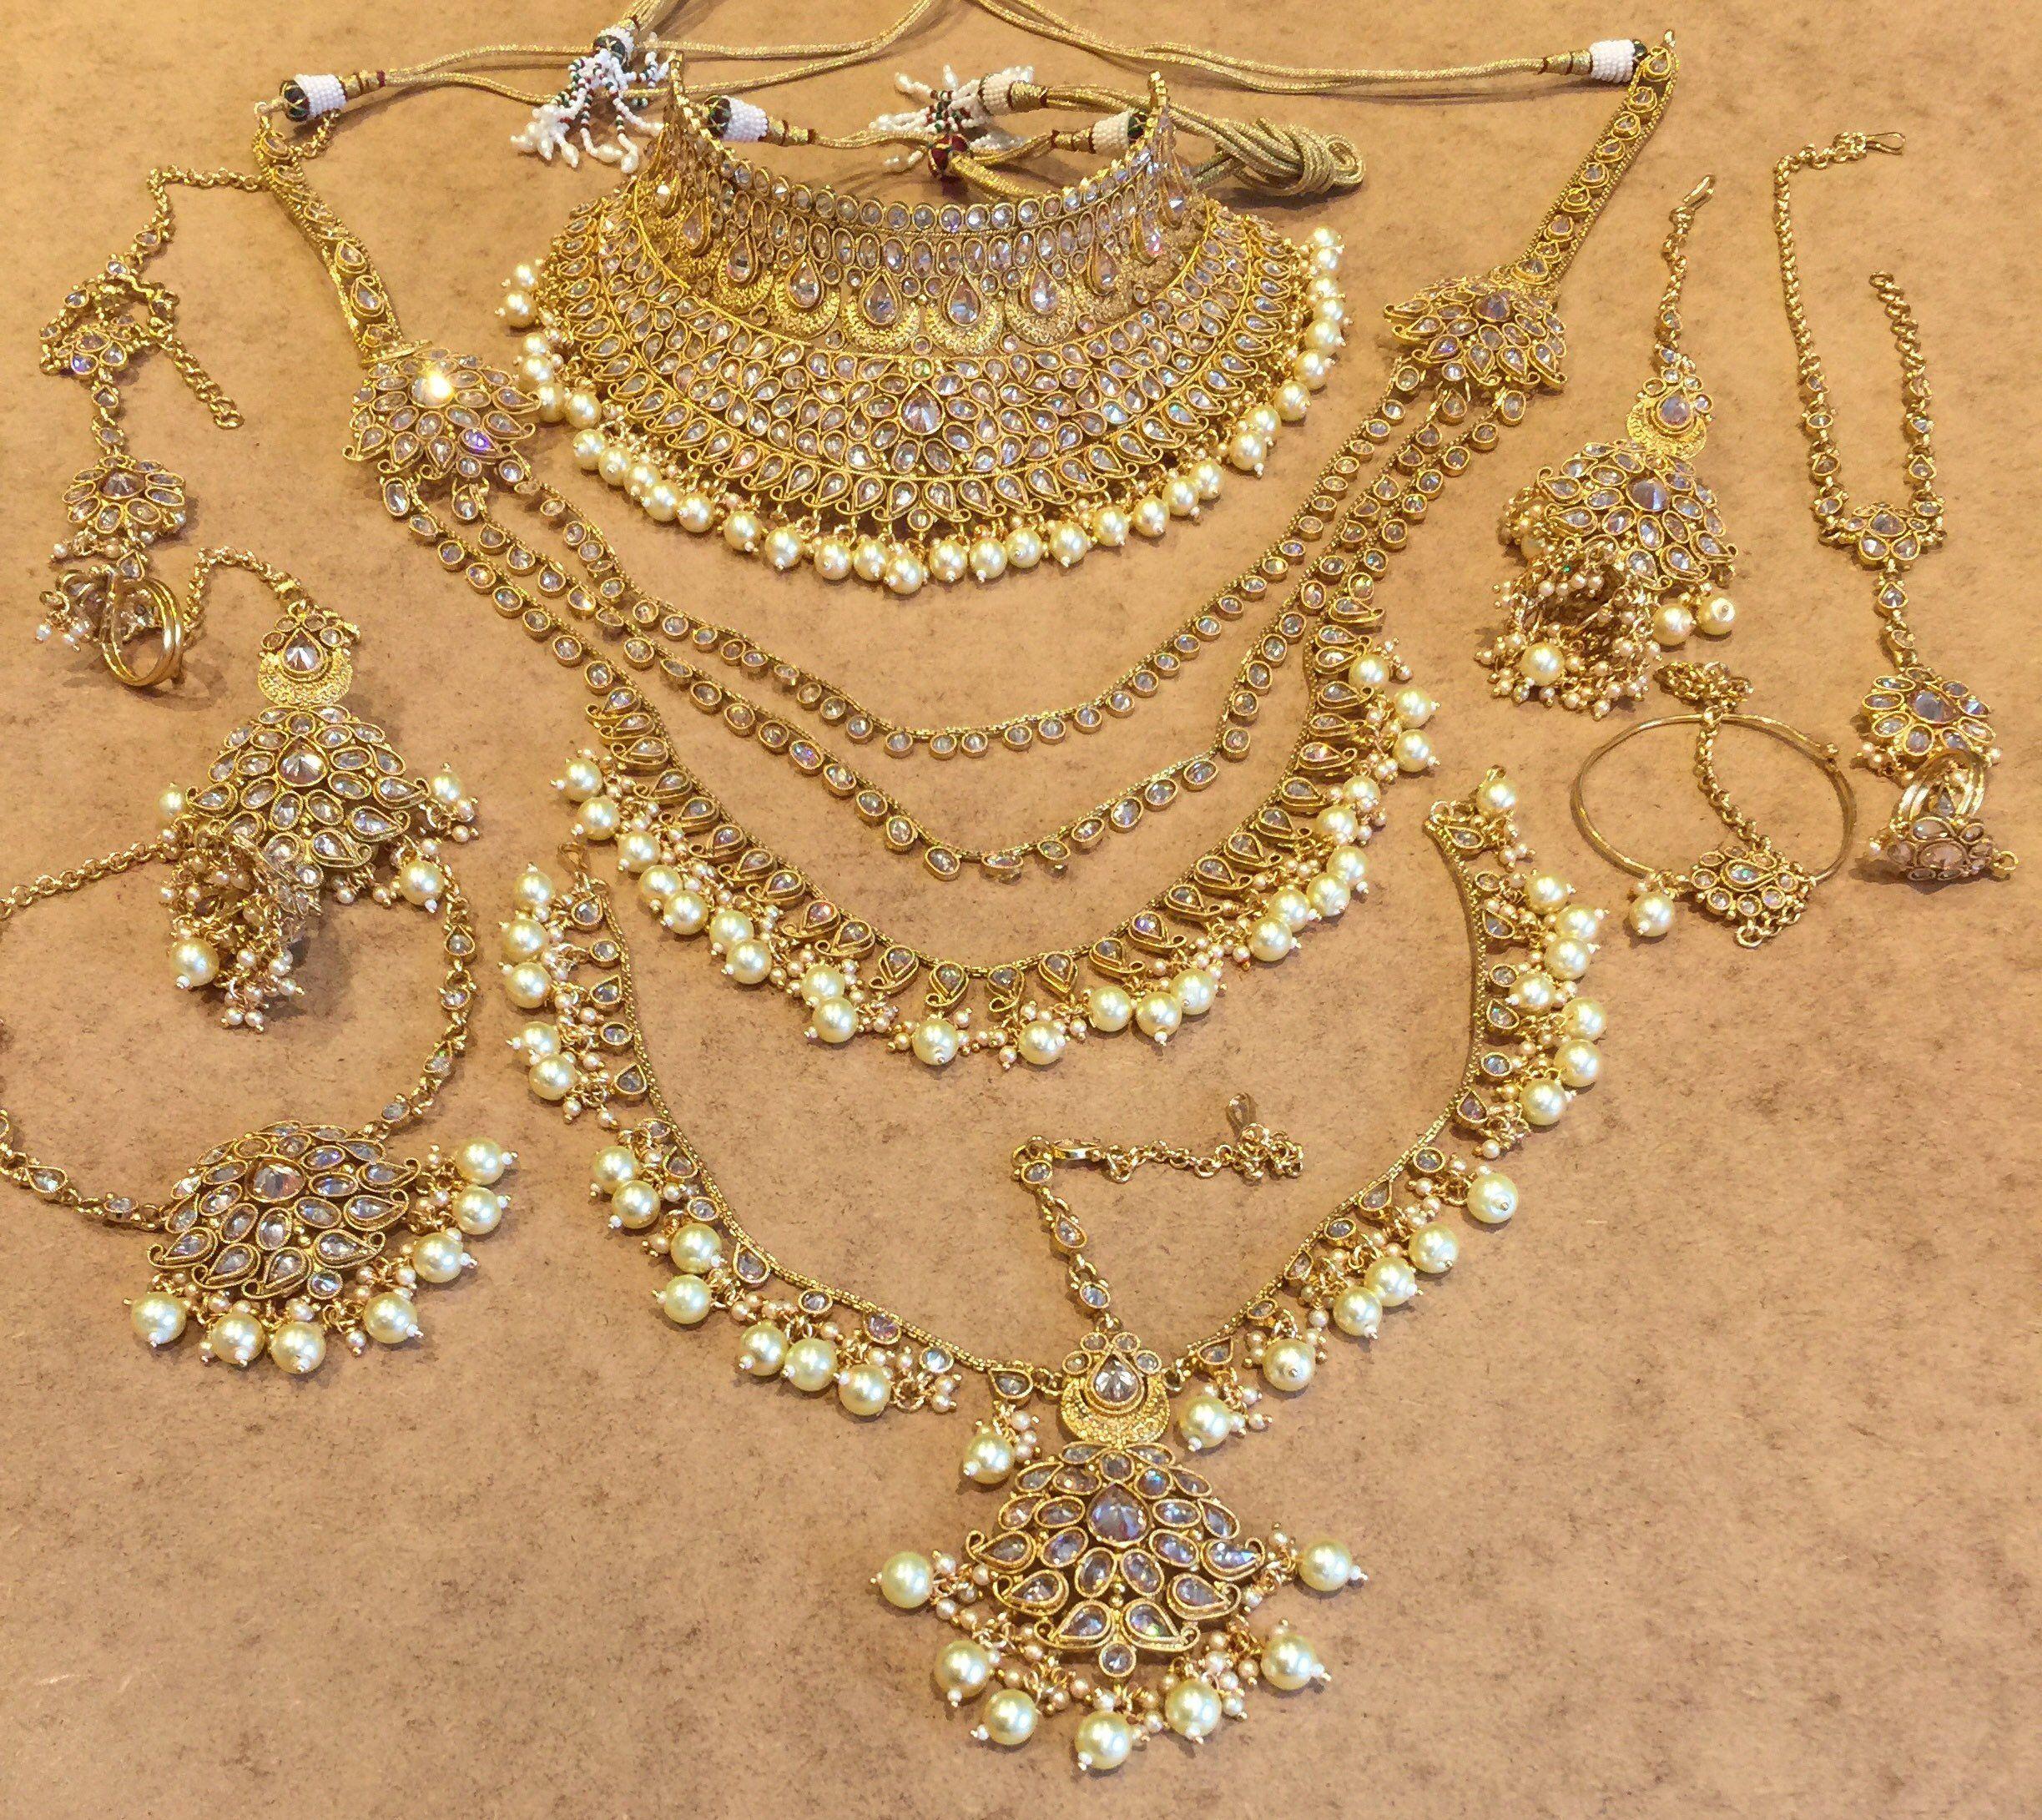 Indian Bridal Gold Pearl Crystal Wedding Jewellery Set Crystal Wedding Jewelry Boho Bridal Jewelry Designer Wedding Jewelry